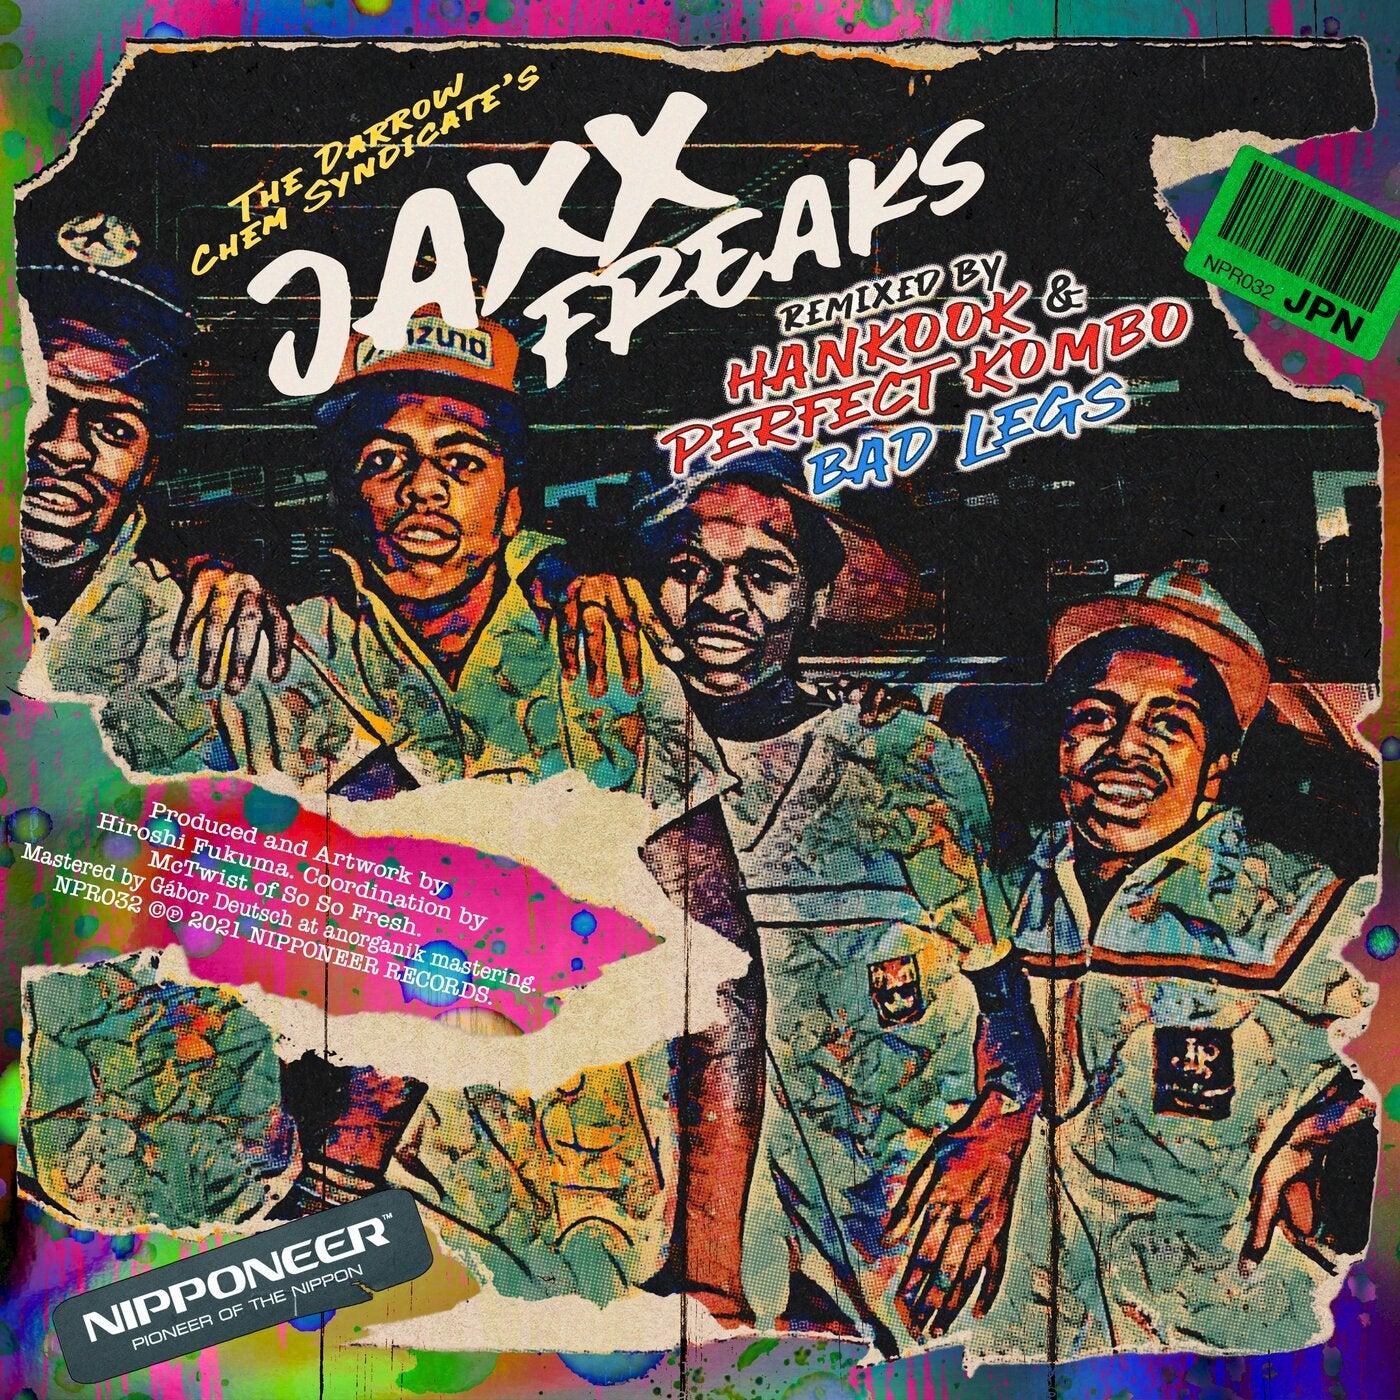 Jaxx Freaks (Hankook & Perfect Kombo Remix)